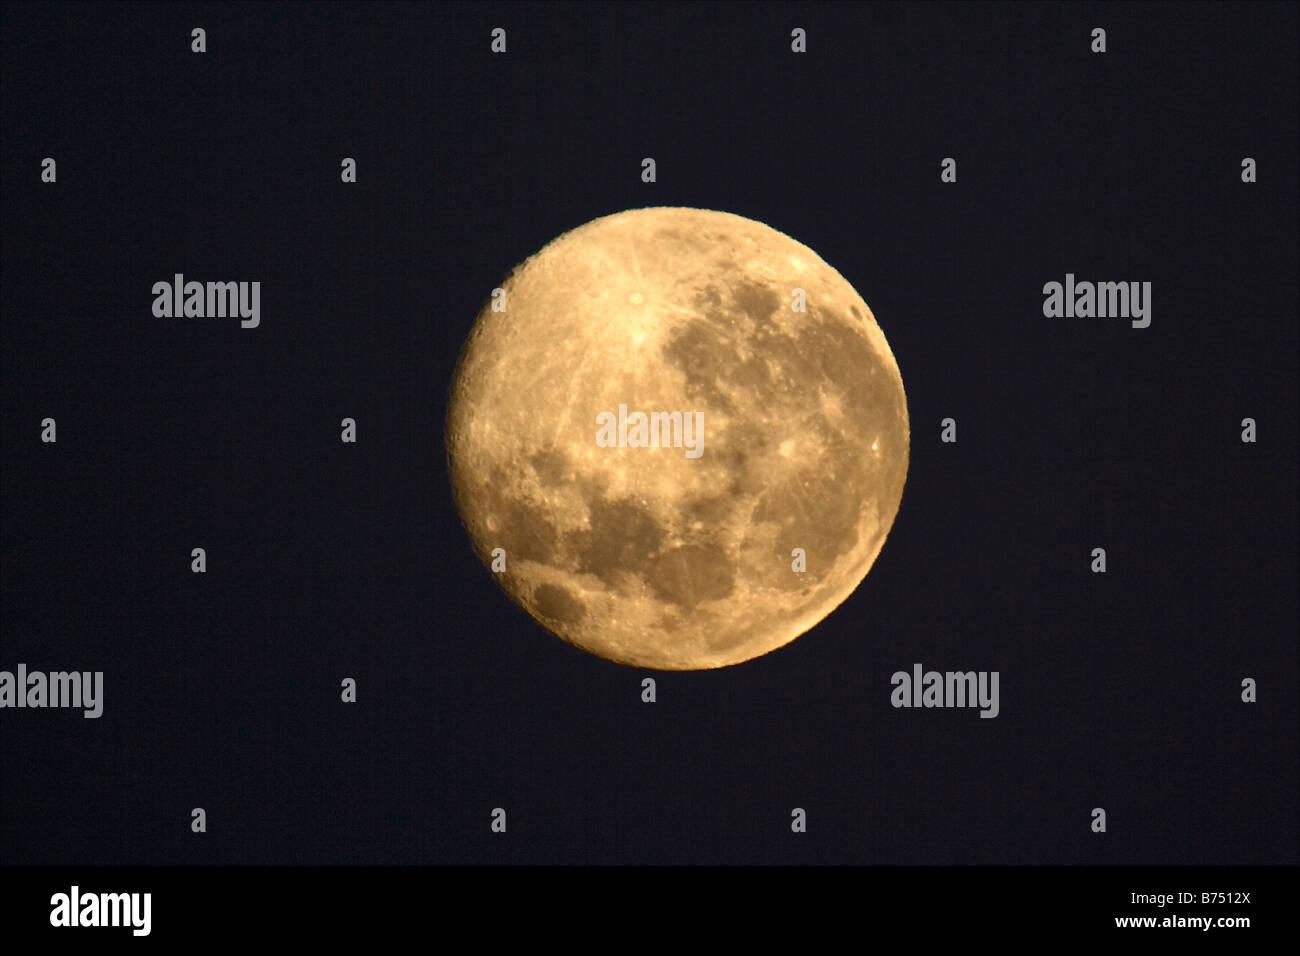 New Zealand, North Island, Whakapapa, Tongariro National Park, full moon. - Stock Image